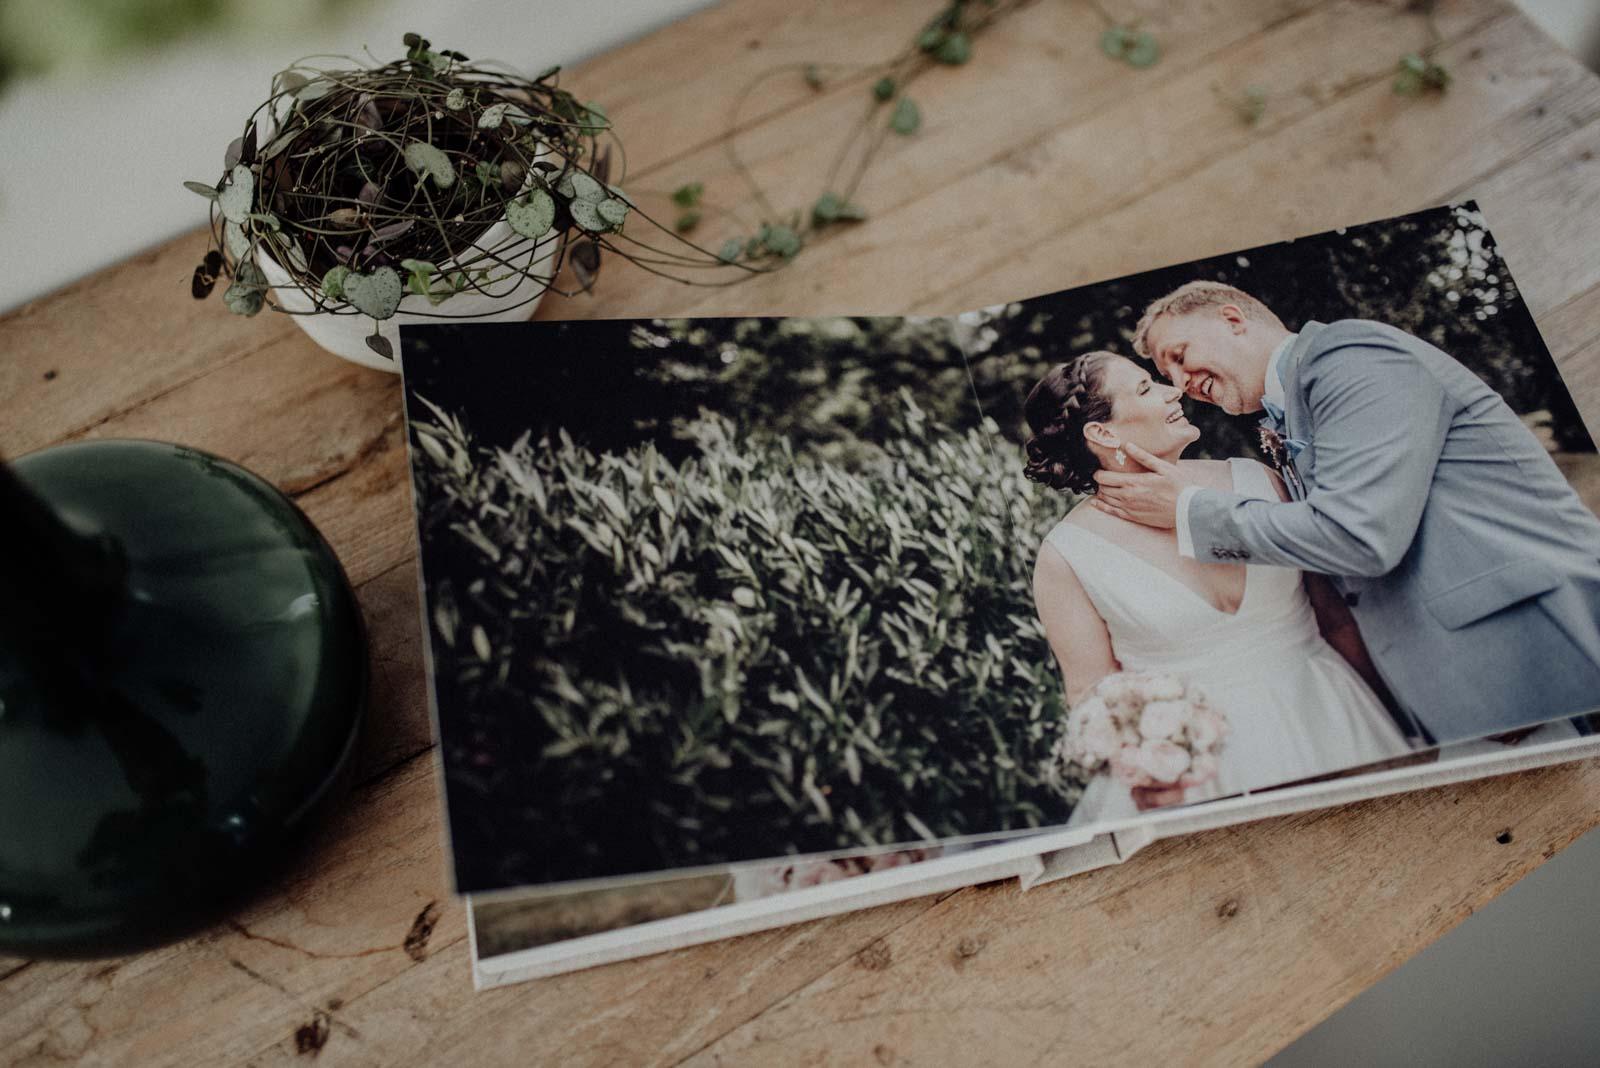 011-Fotoalbum-Fotobuch-Premium-Fotograf-Witten-Luxus